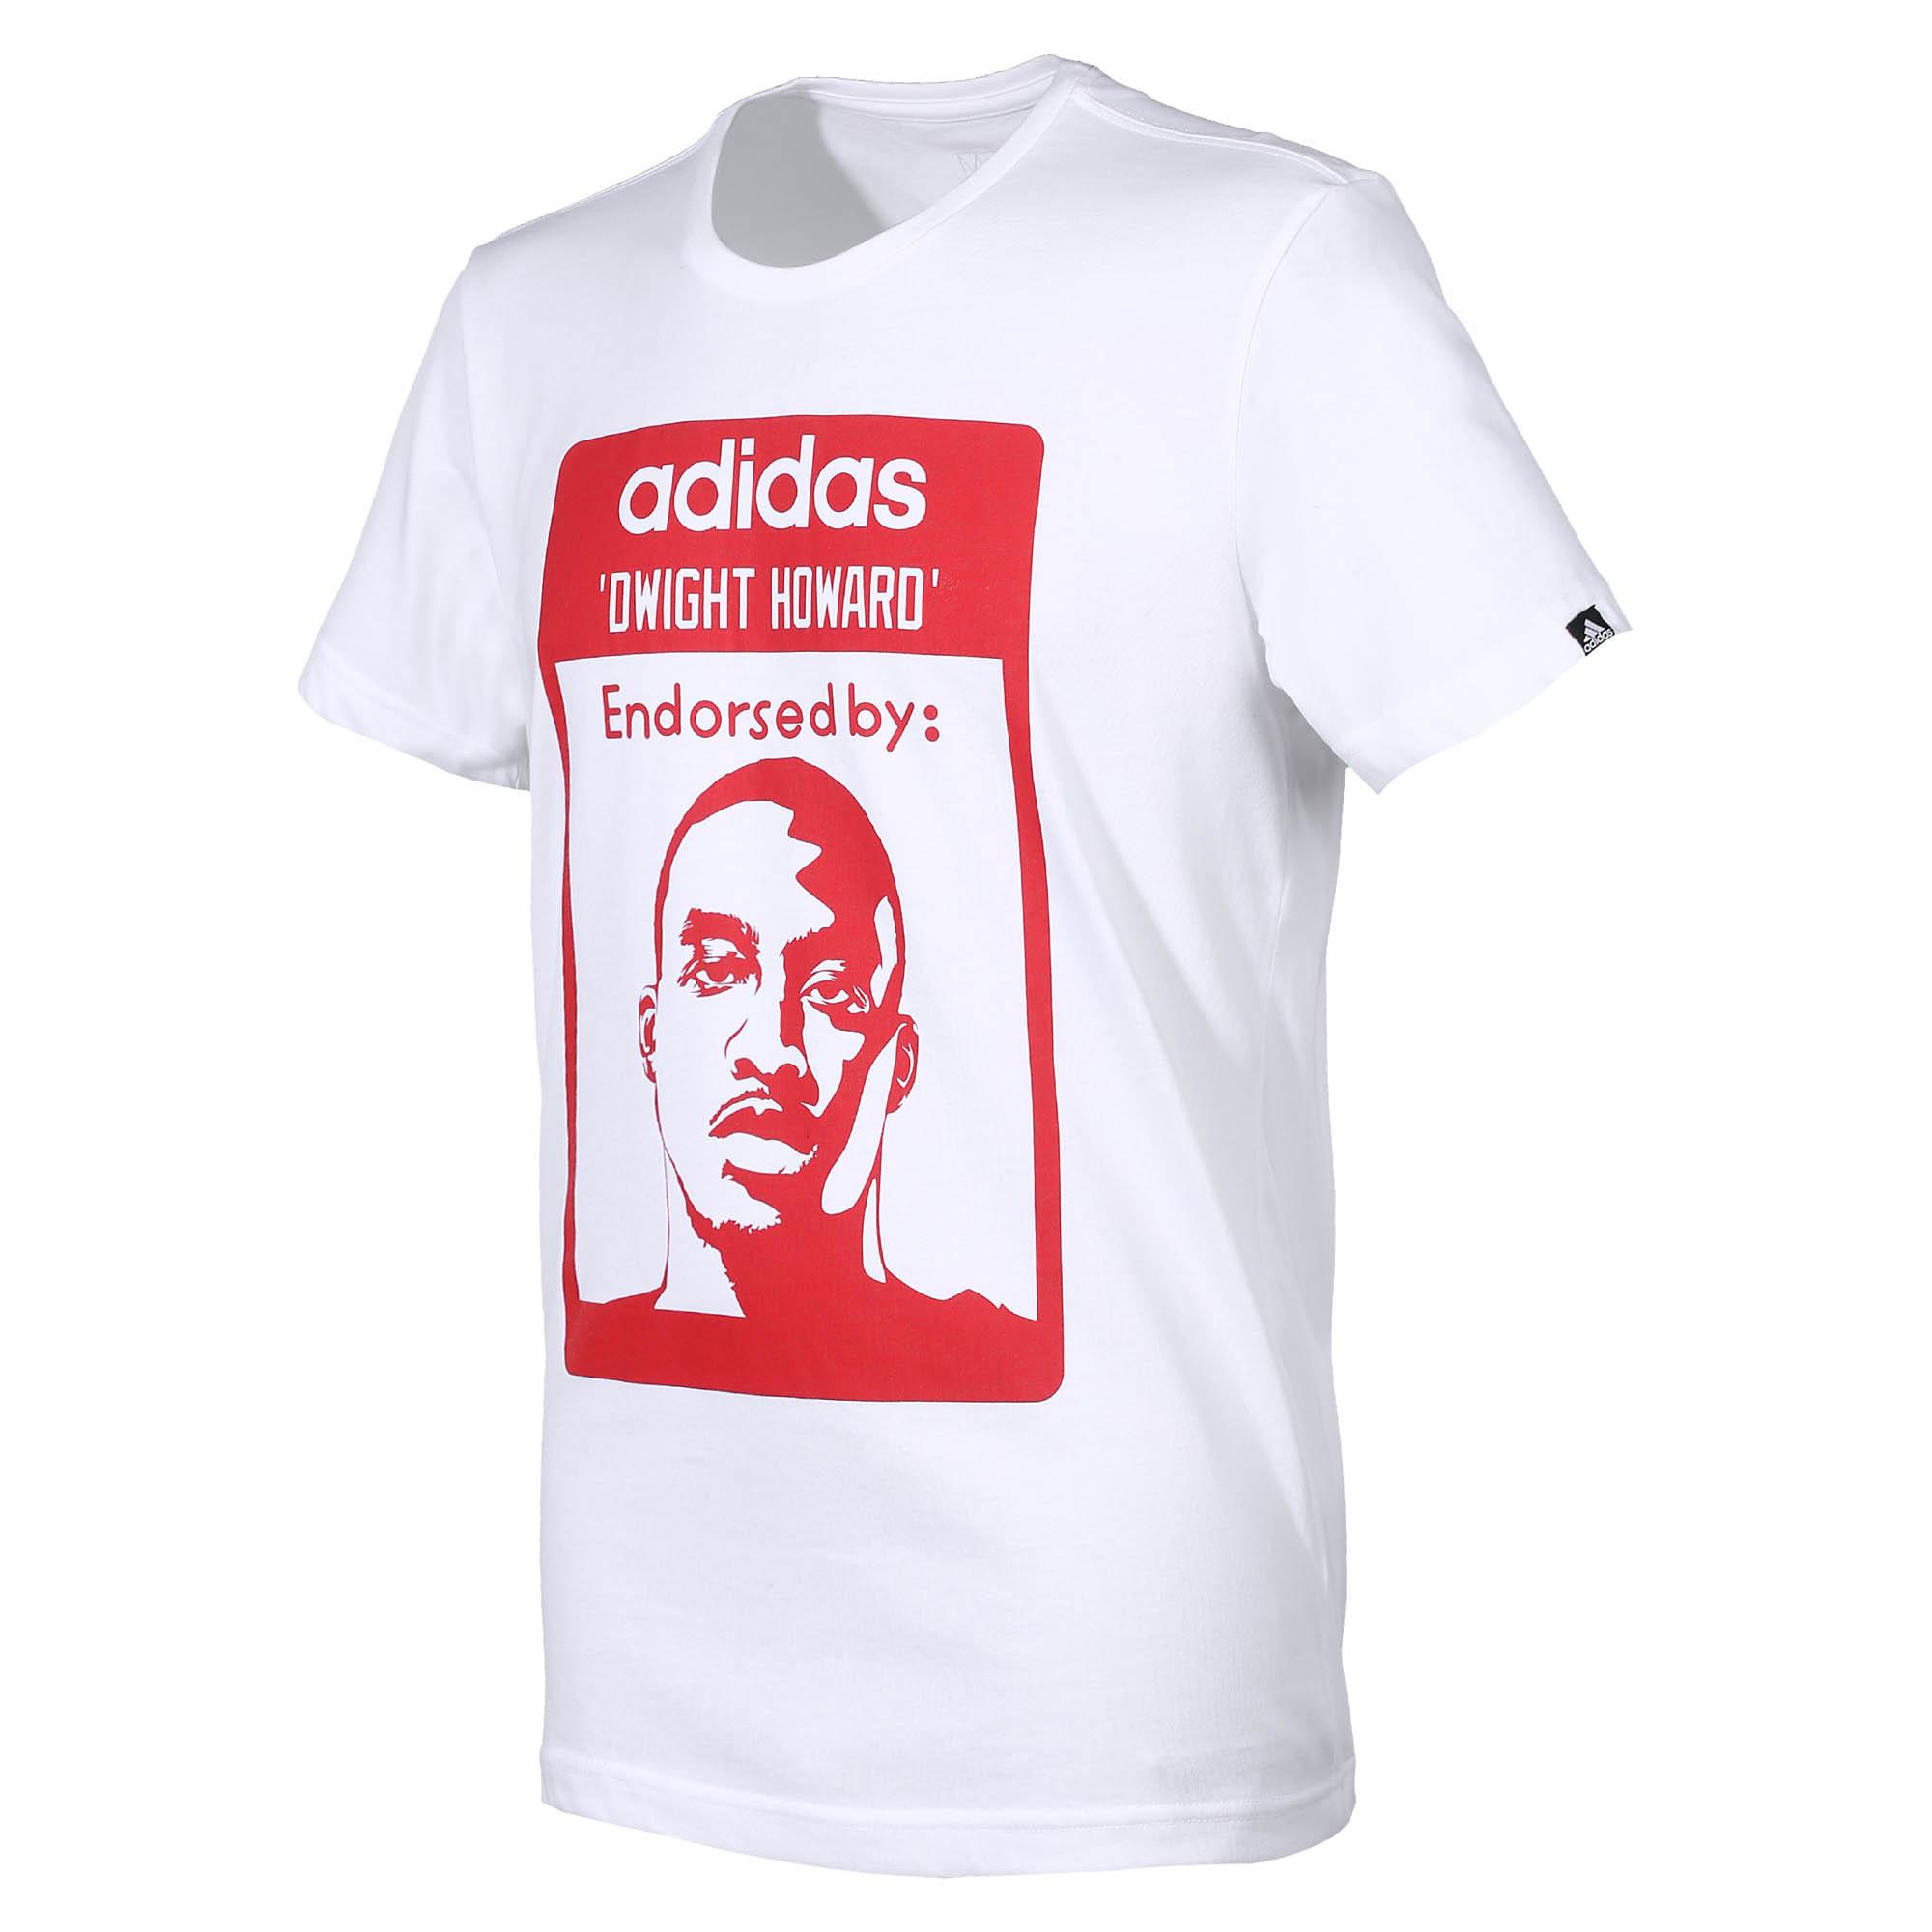 Adidas Camiseta Endorsed By Dwight Howard Blanco Rojo